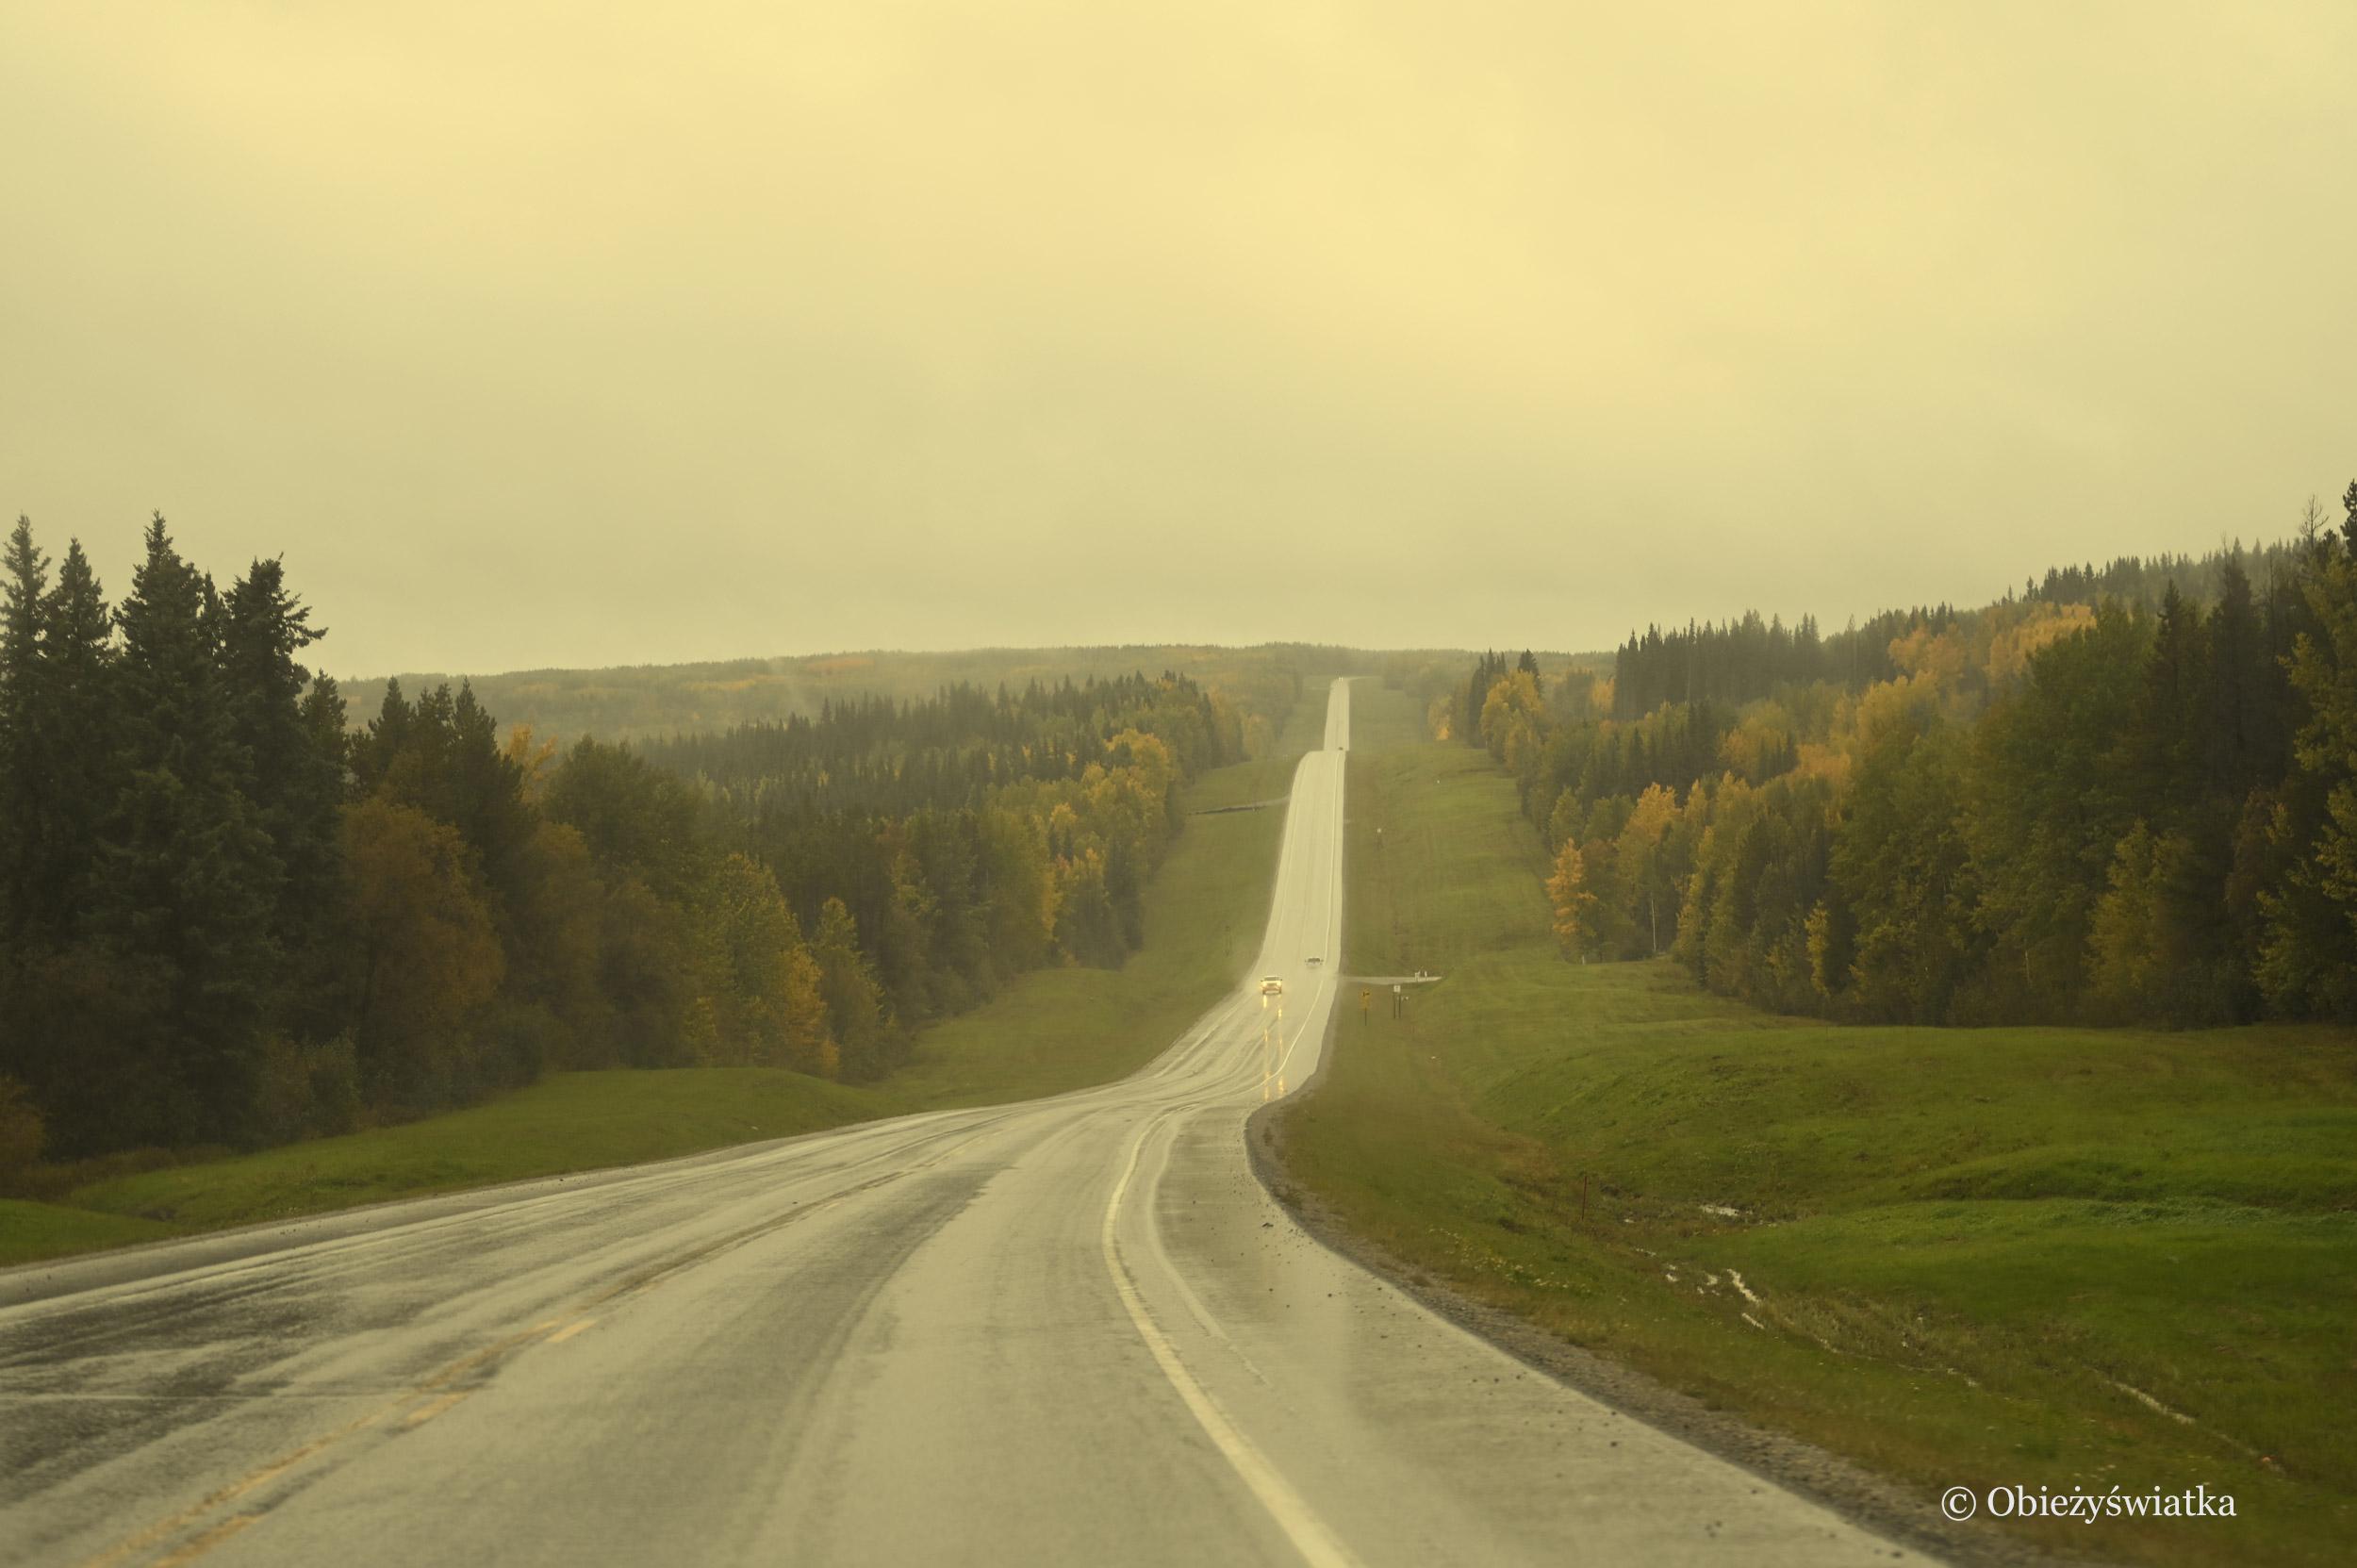 Deszczowo i mglisto - Alaska Highway, Kanada